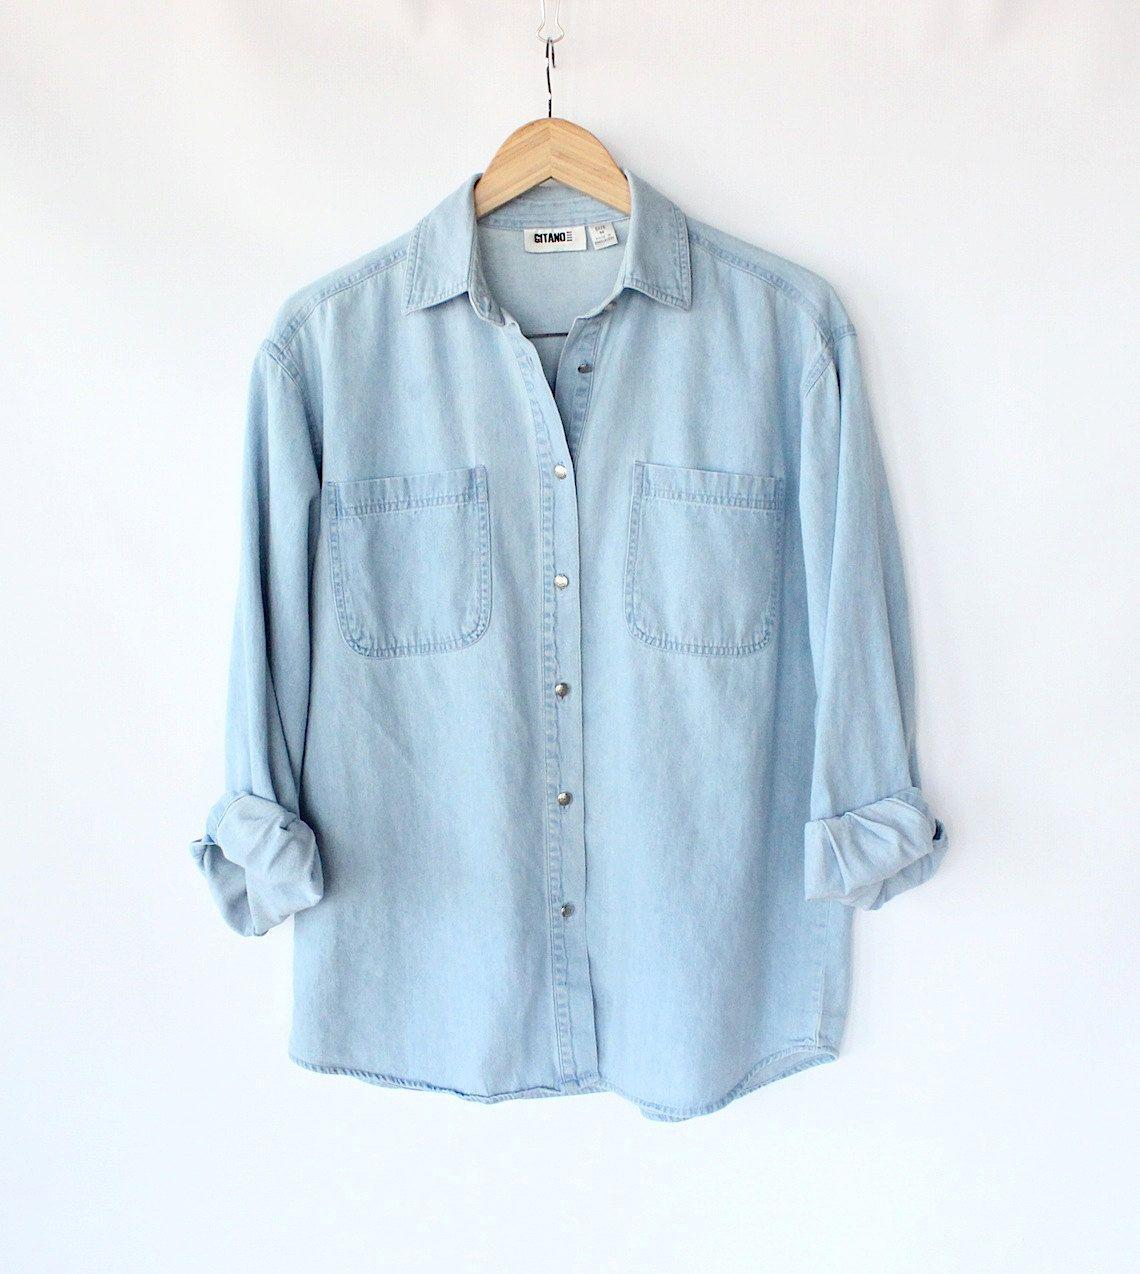 Vintage 80s Light Blue Jean Button Up Shirt // Women's Spring Denim Top. $30.00, via Etsy.